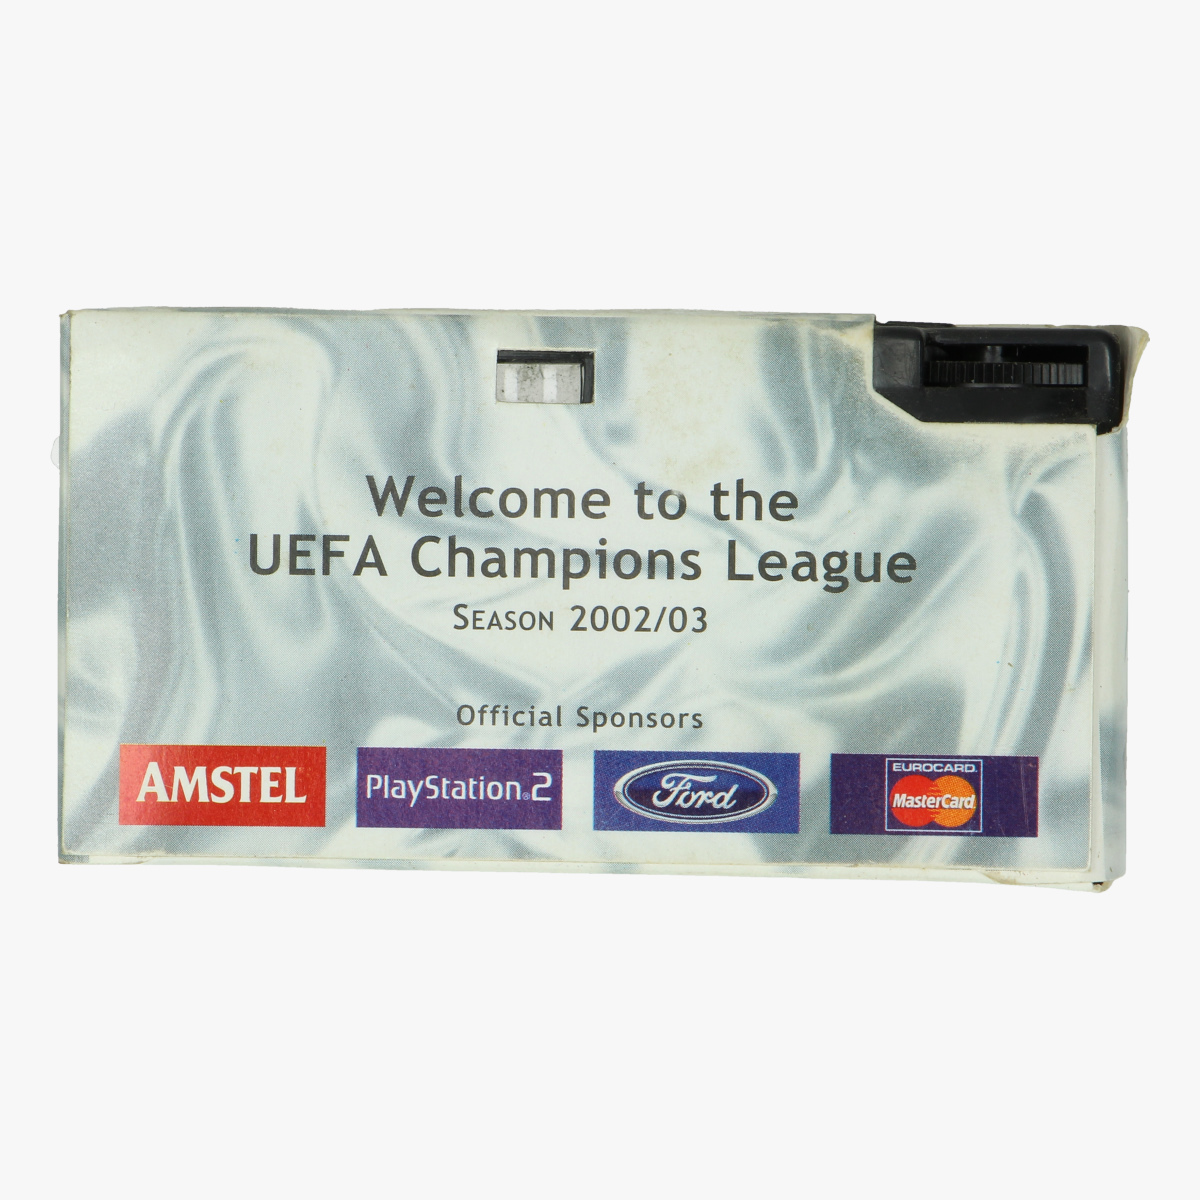 Afbeeldingen van wegwerp camerea uefa champions league. season 2002/03 voetbal